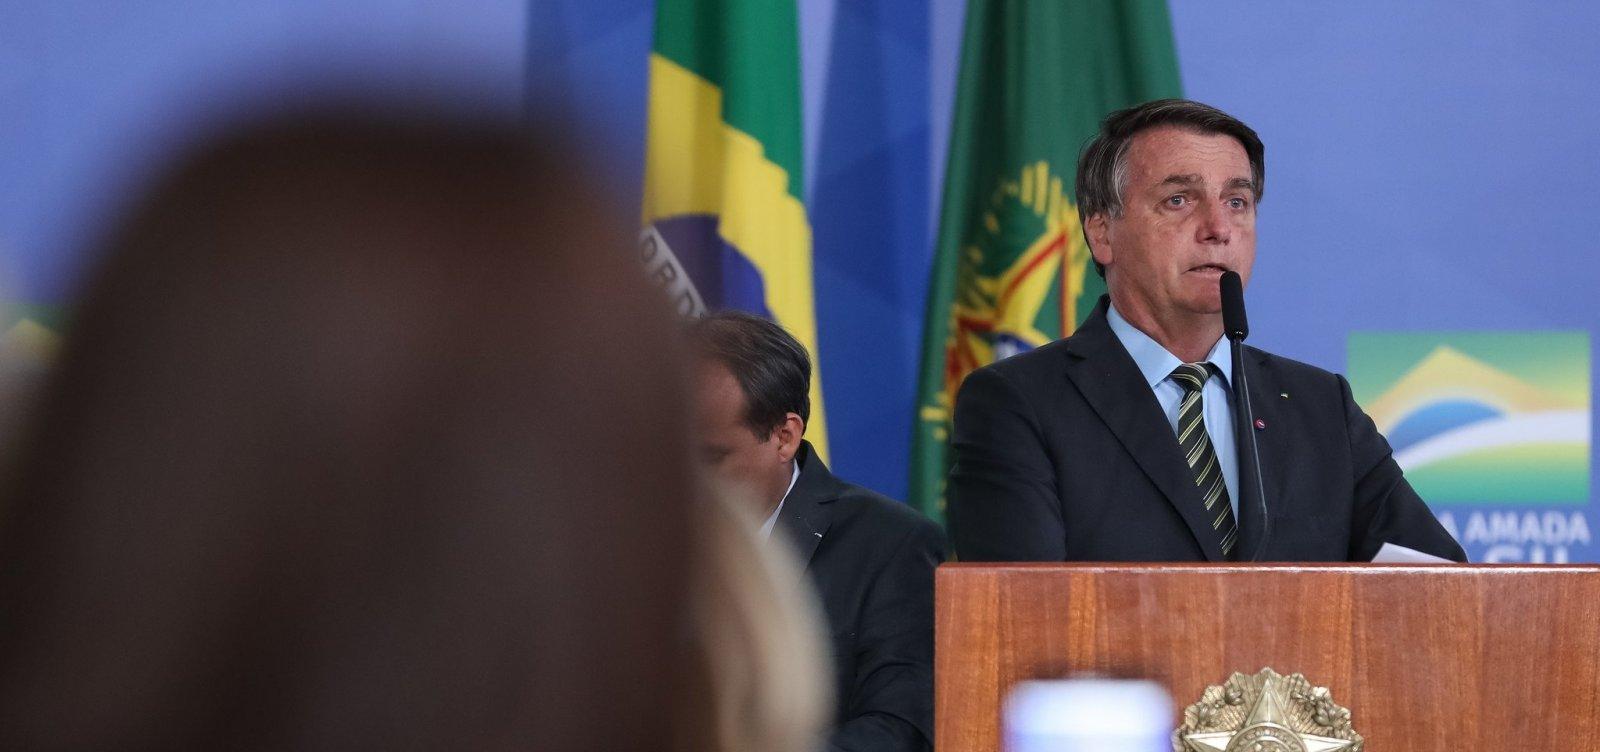 Bolsonaro sanciona, com 1 veto, lei que dispensa reembolso por eventos cancelados durante pandemia